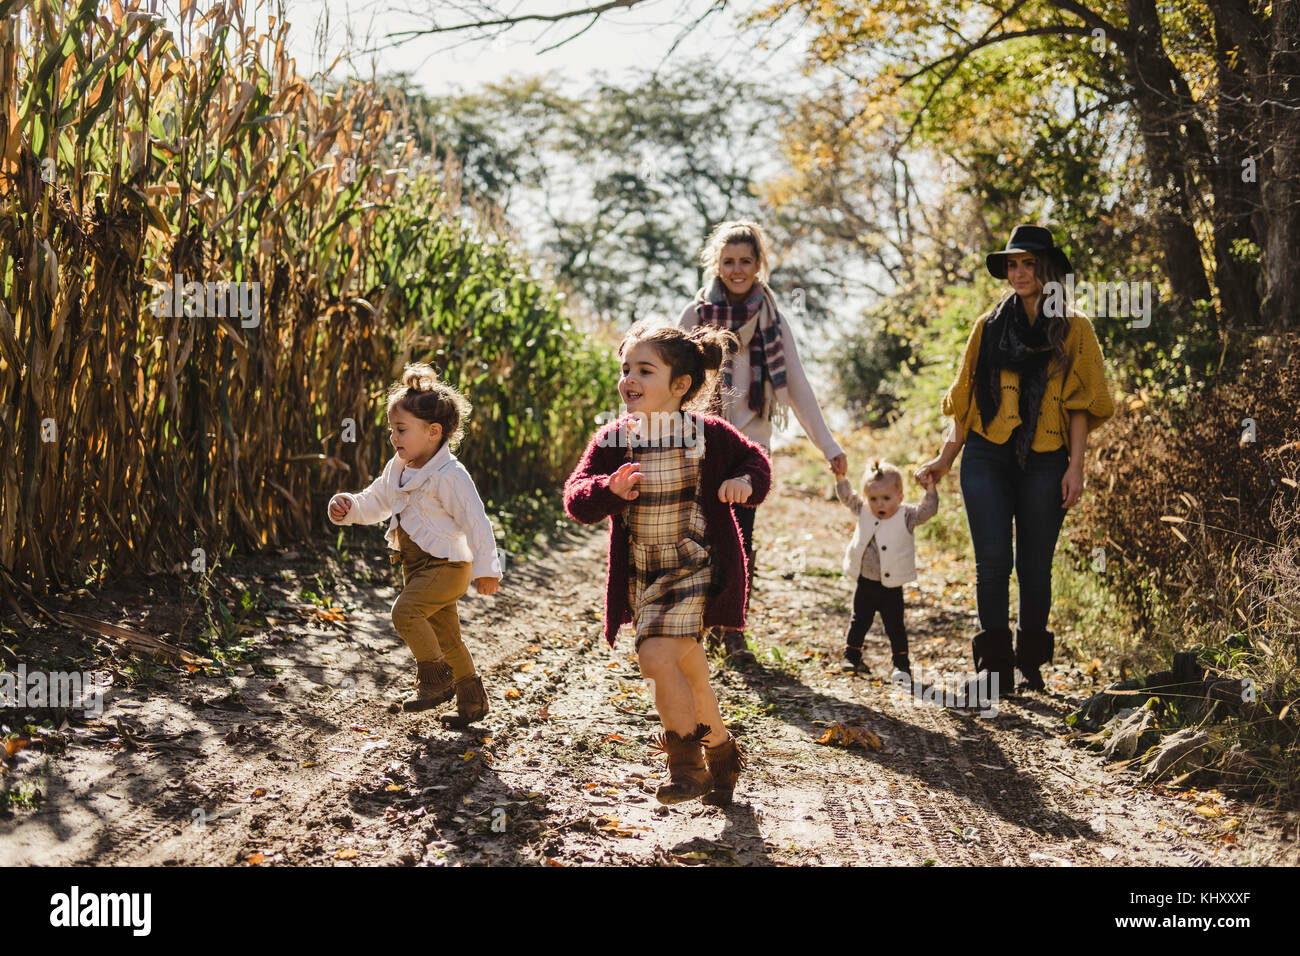 Frauen mit Kindern auf Feldweg, Oshawa, Kanada, Nordamerika Stockbild